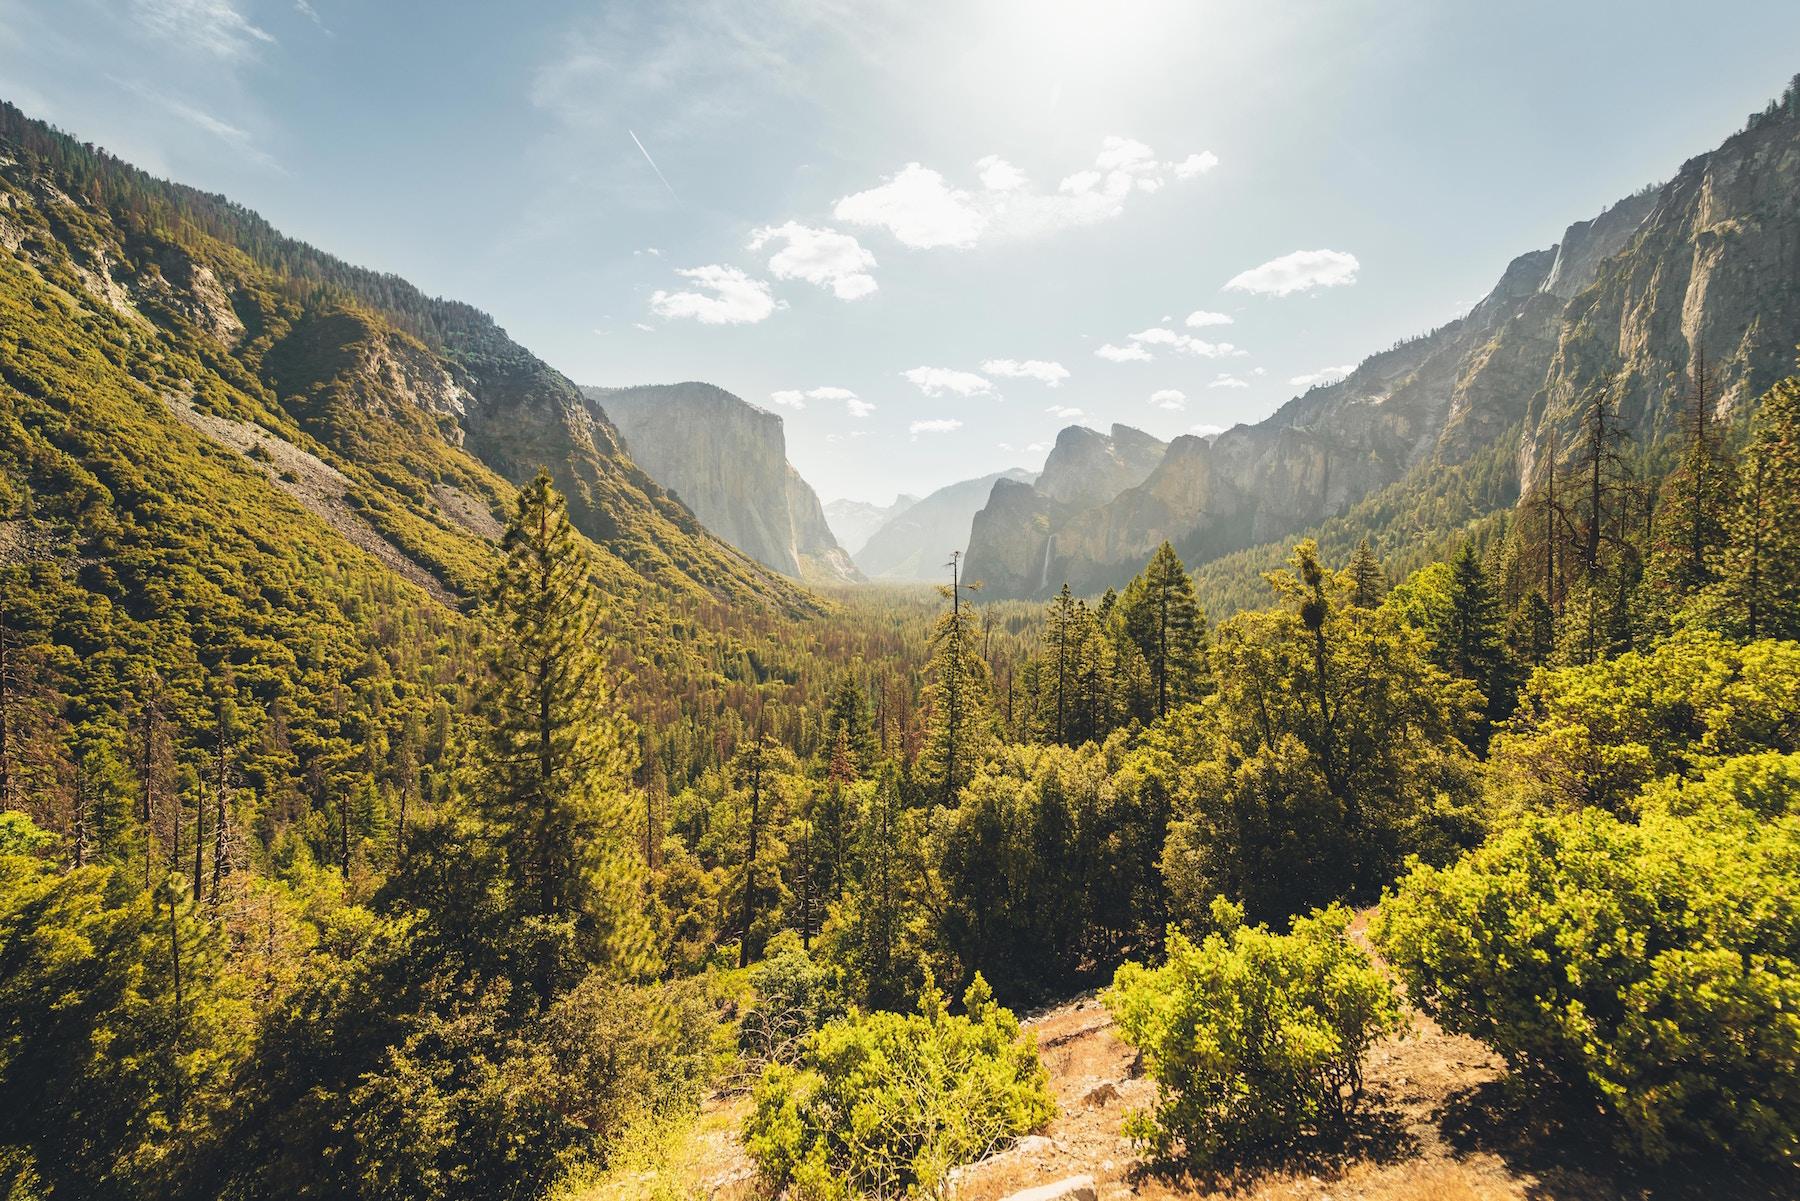 Yosemite I Outdoorsy RV Rental Marketplace